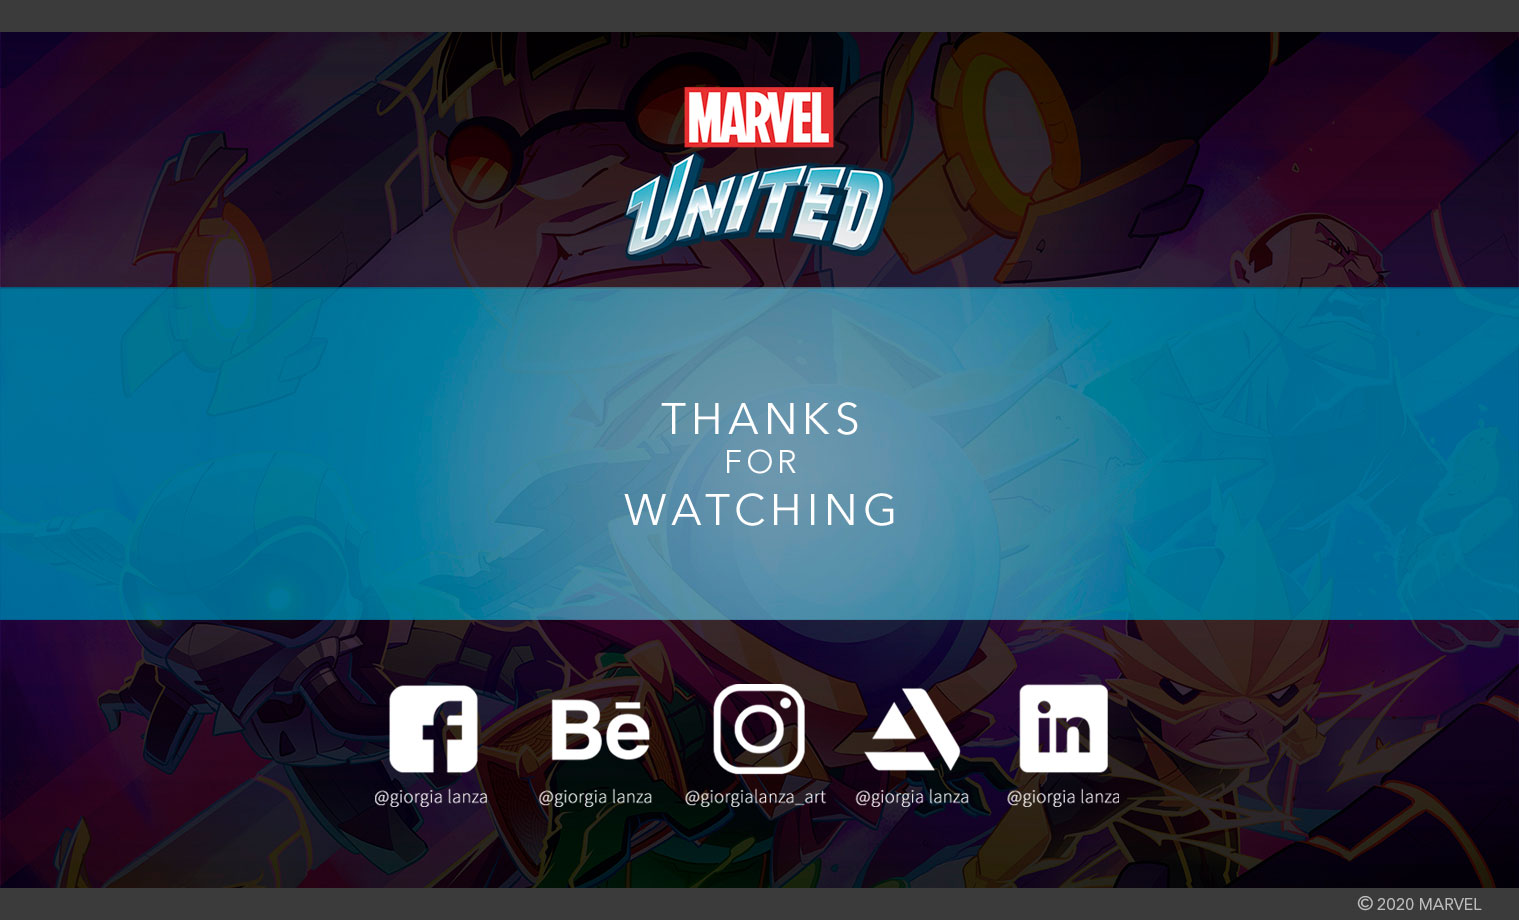 Marvel United_Giorgia Lanza